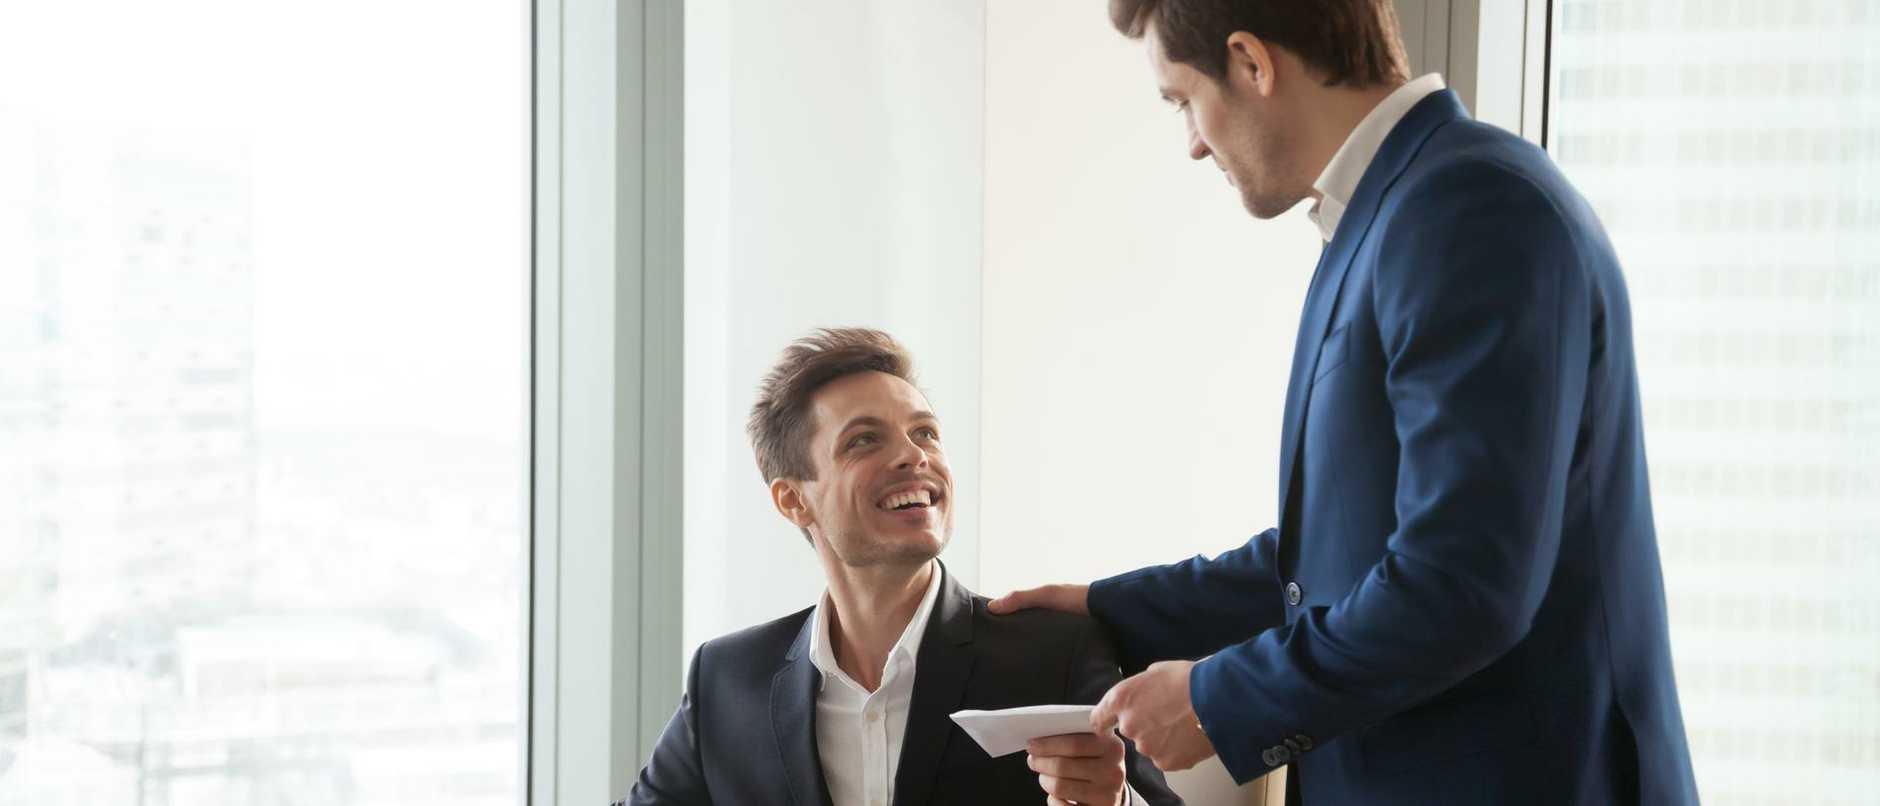 Boss giving money premium to happy employee